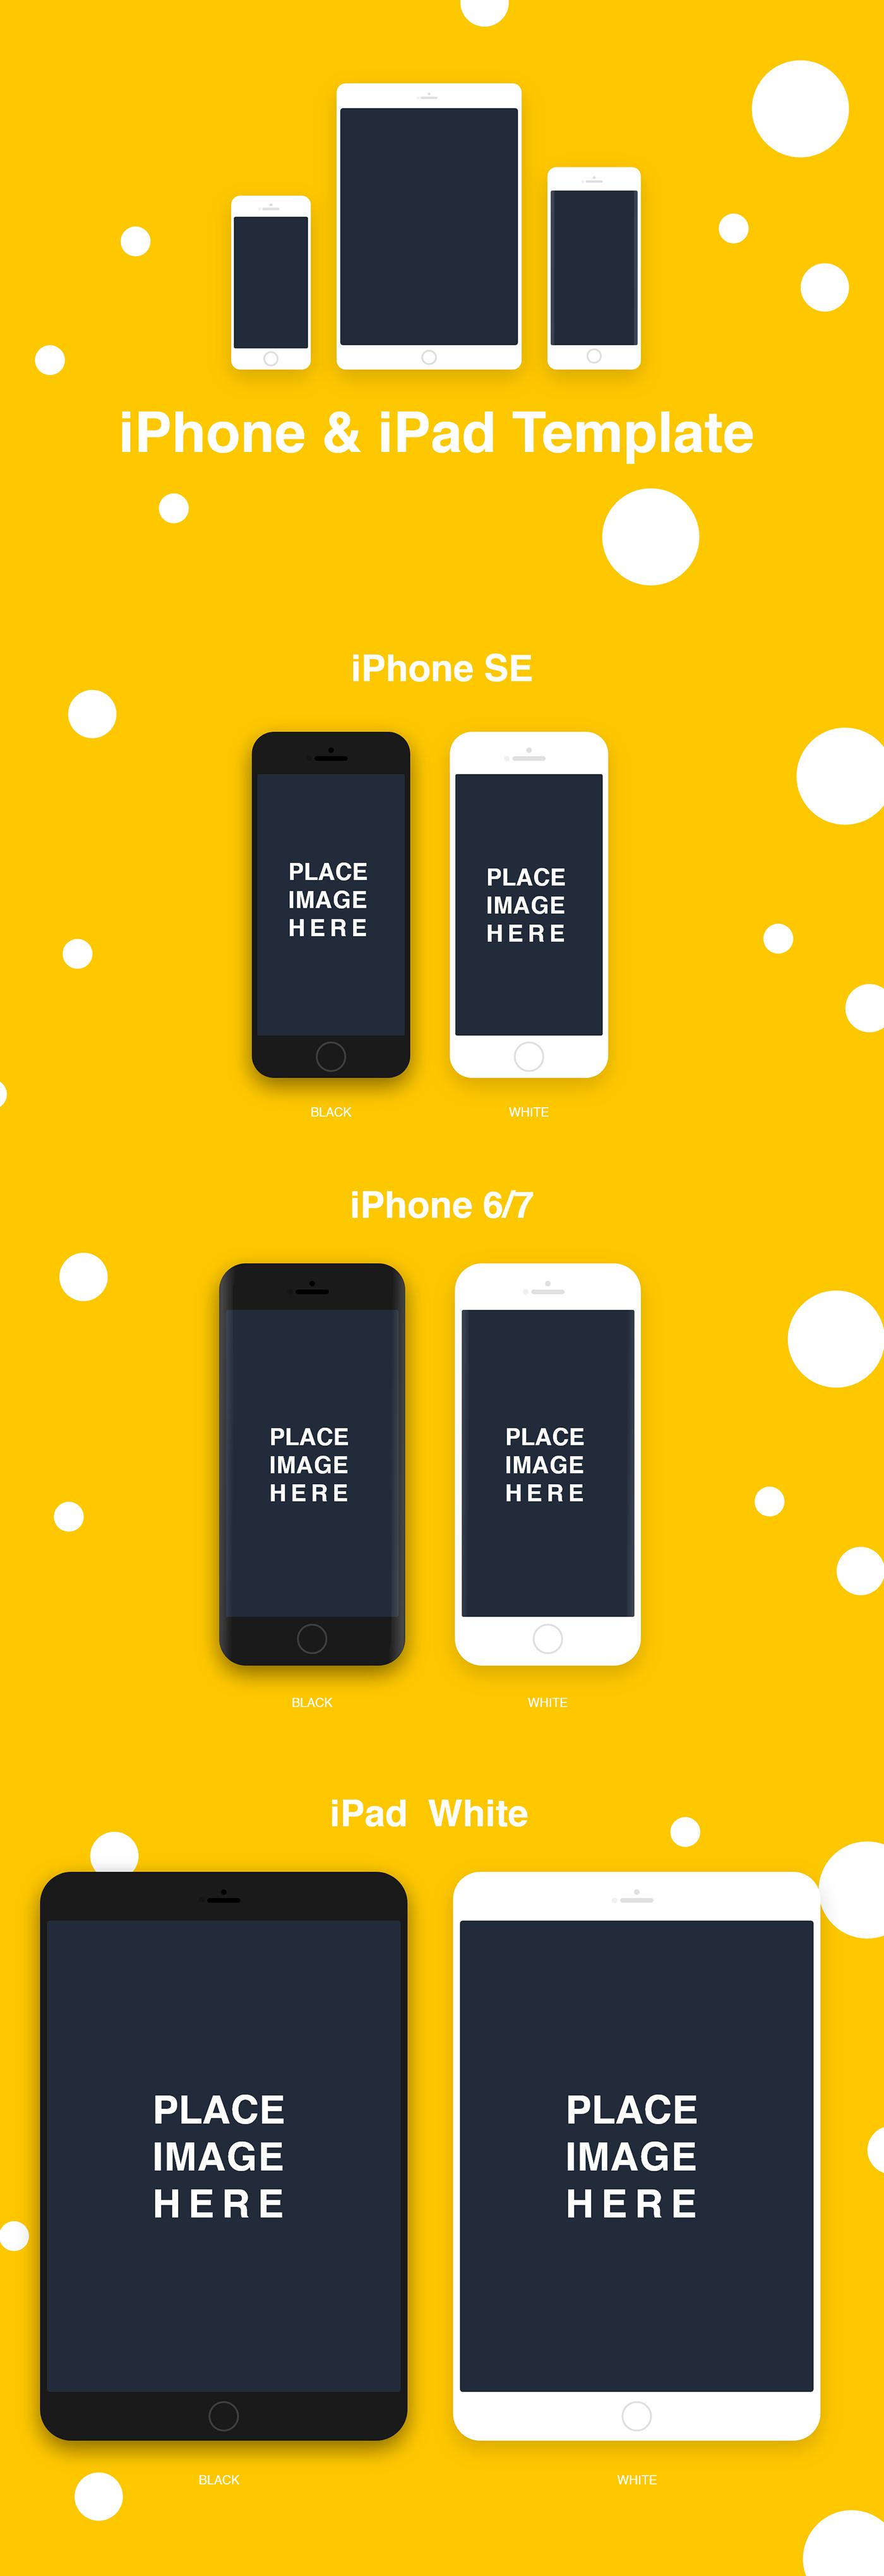 apple free free download iPhone & iPad template